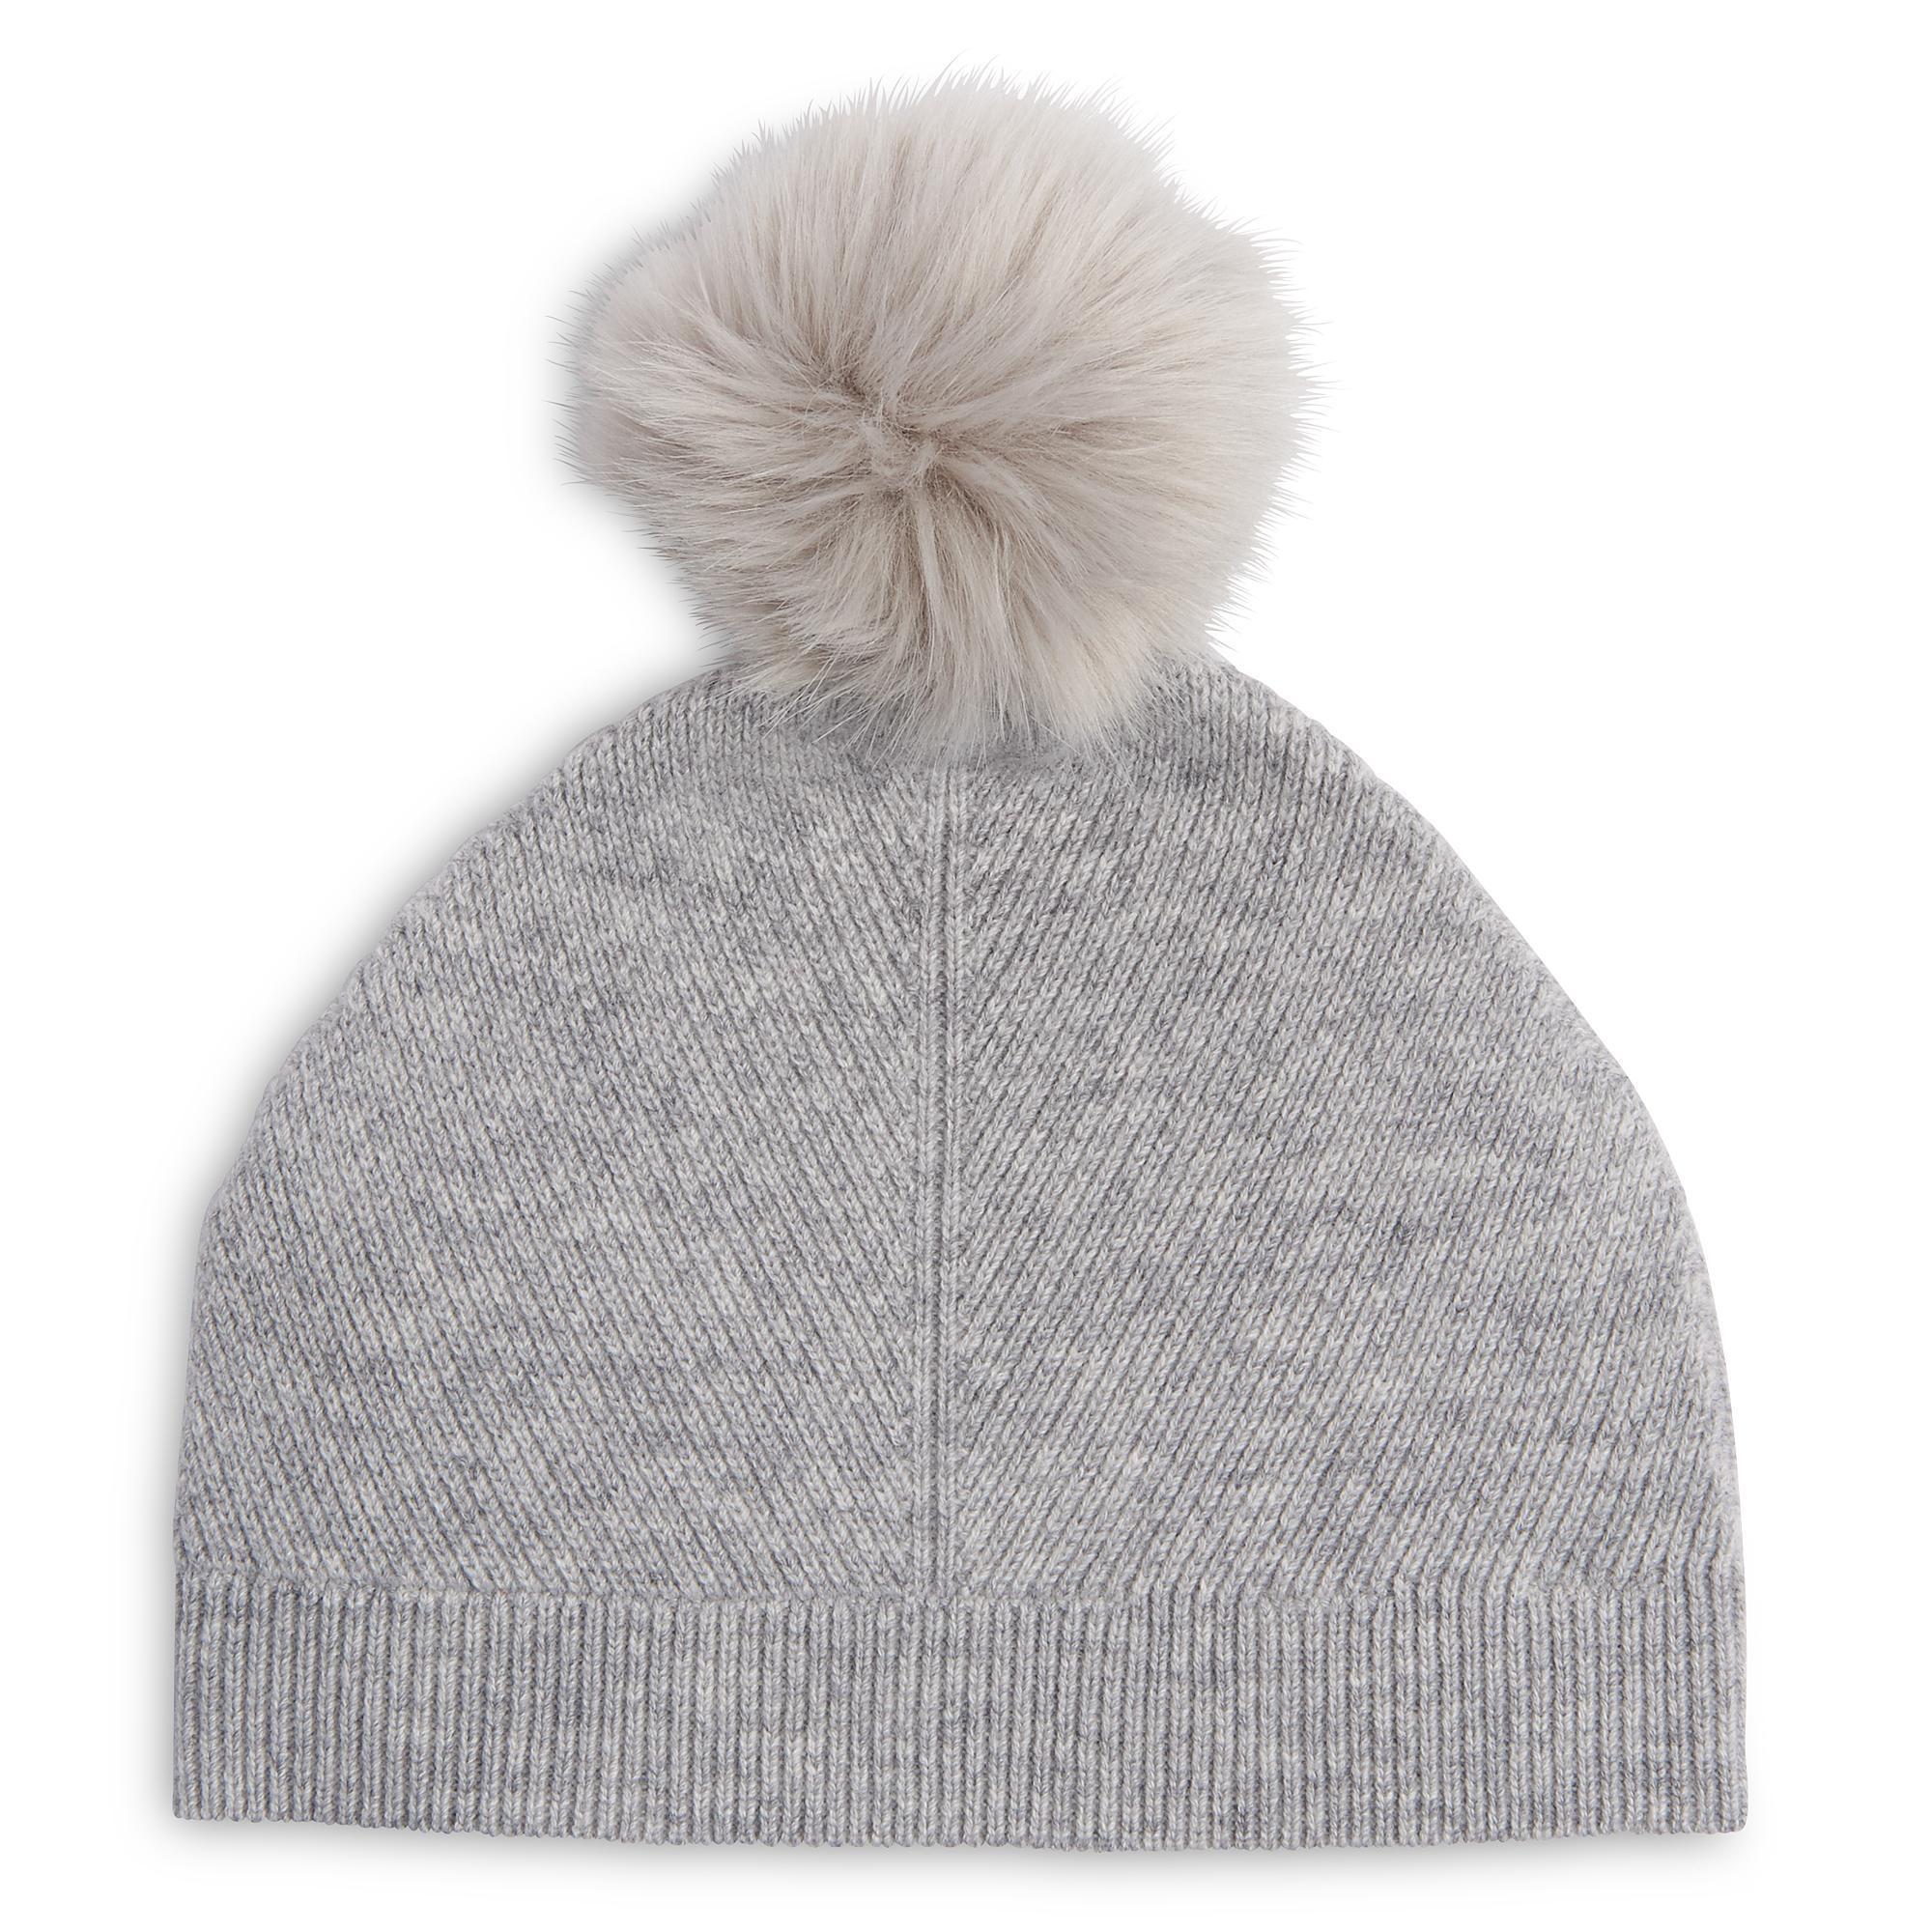 55043d91a2e26 ... germany lk knit hat grey 859fe c2237